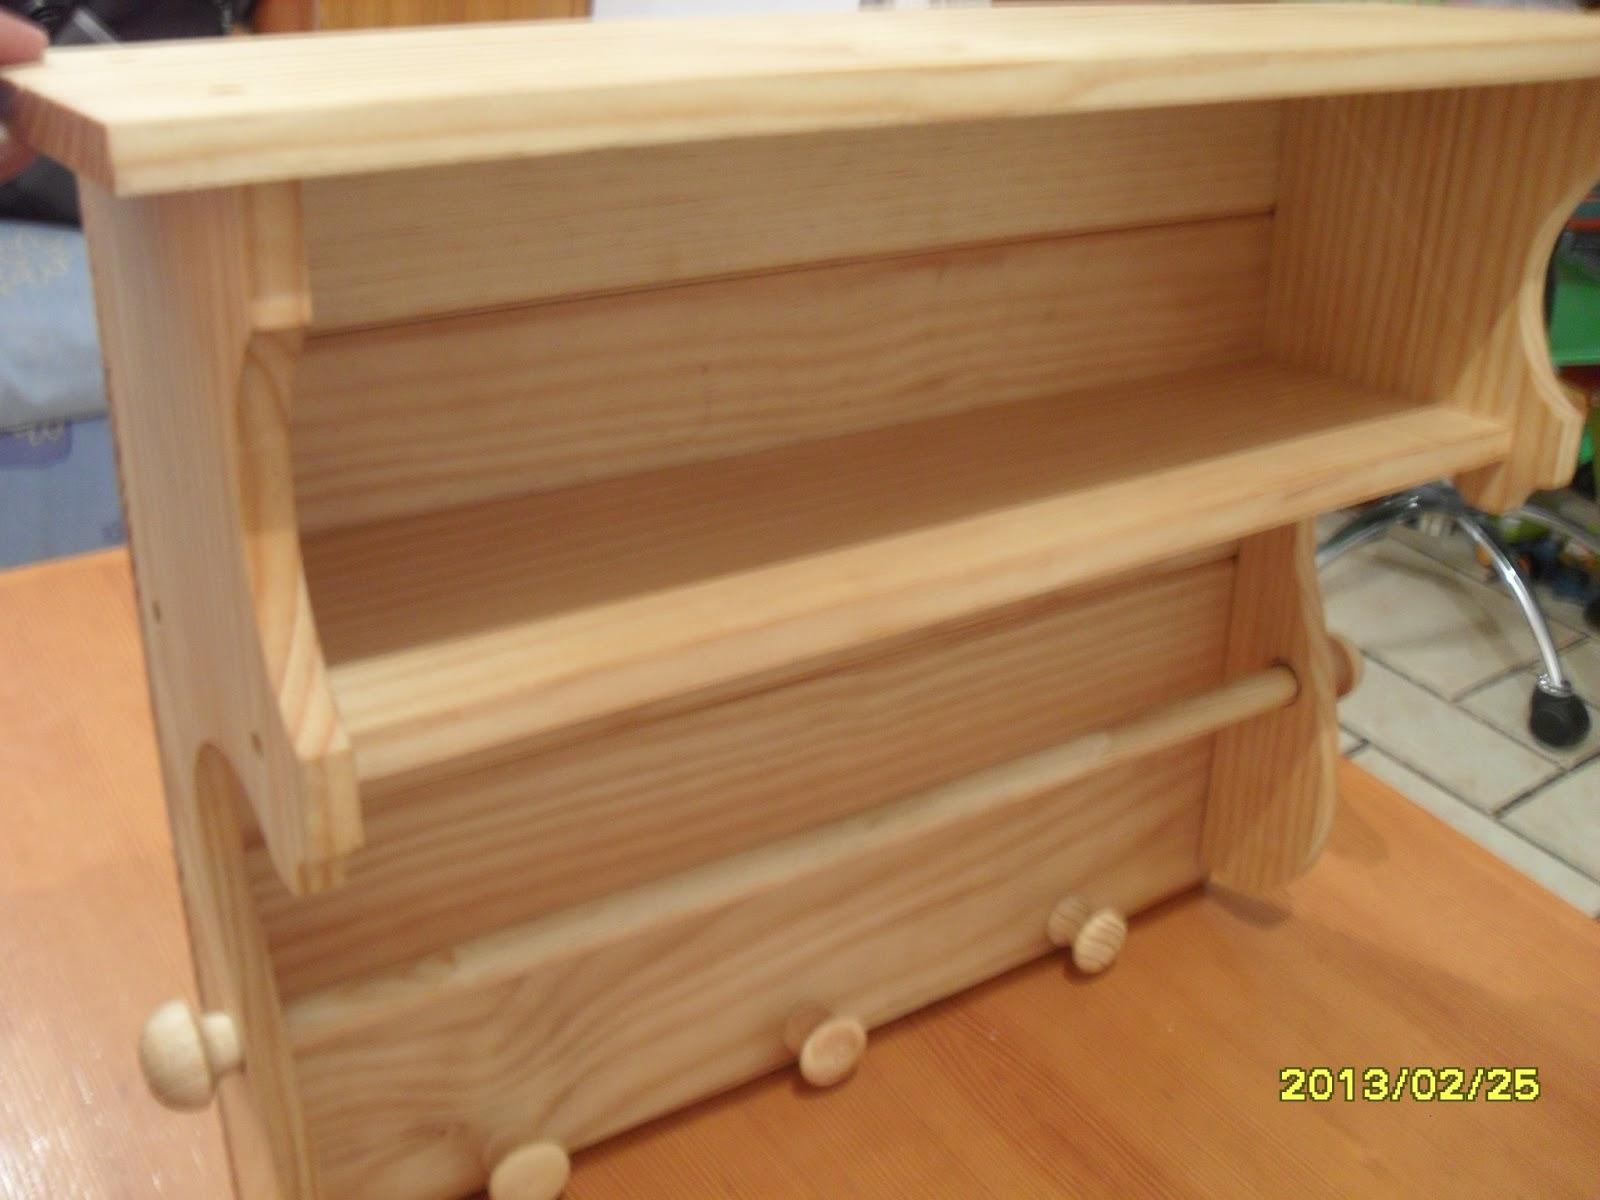 Manualidades en mdf febrero 2013 - Bolas de madera para manualidades ...